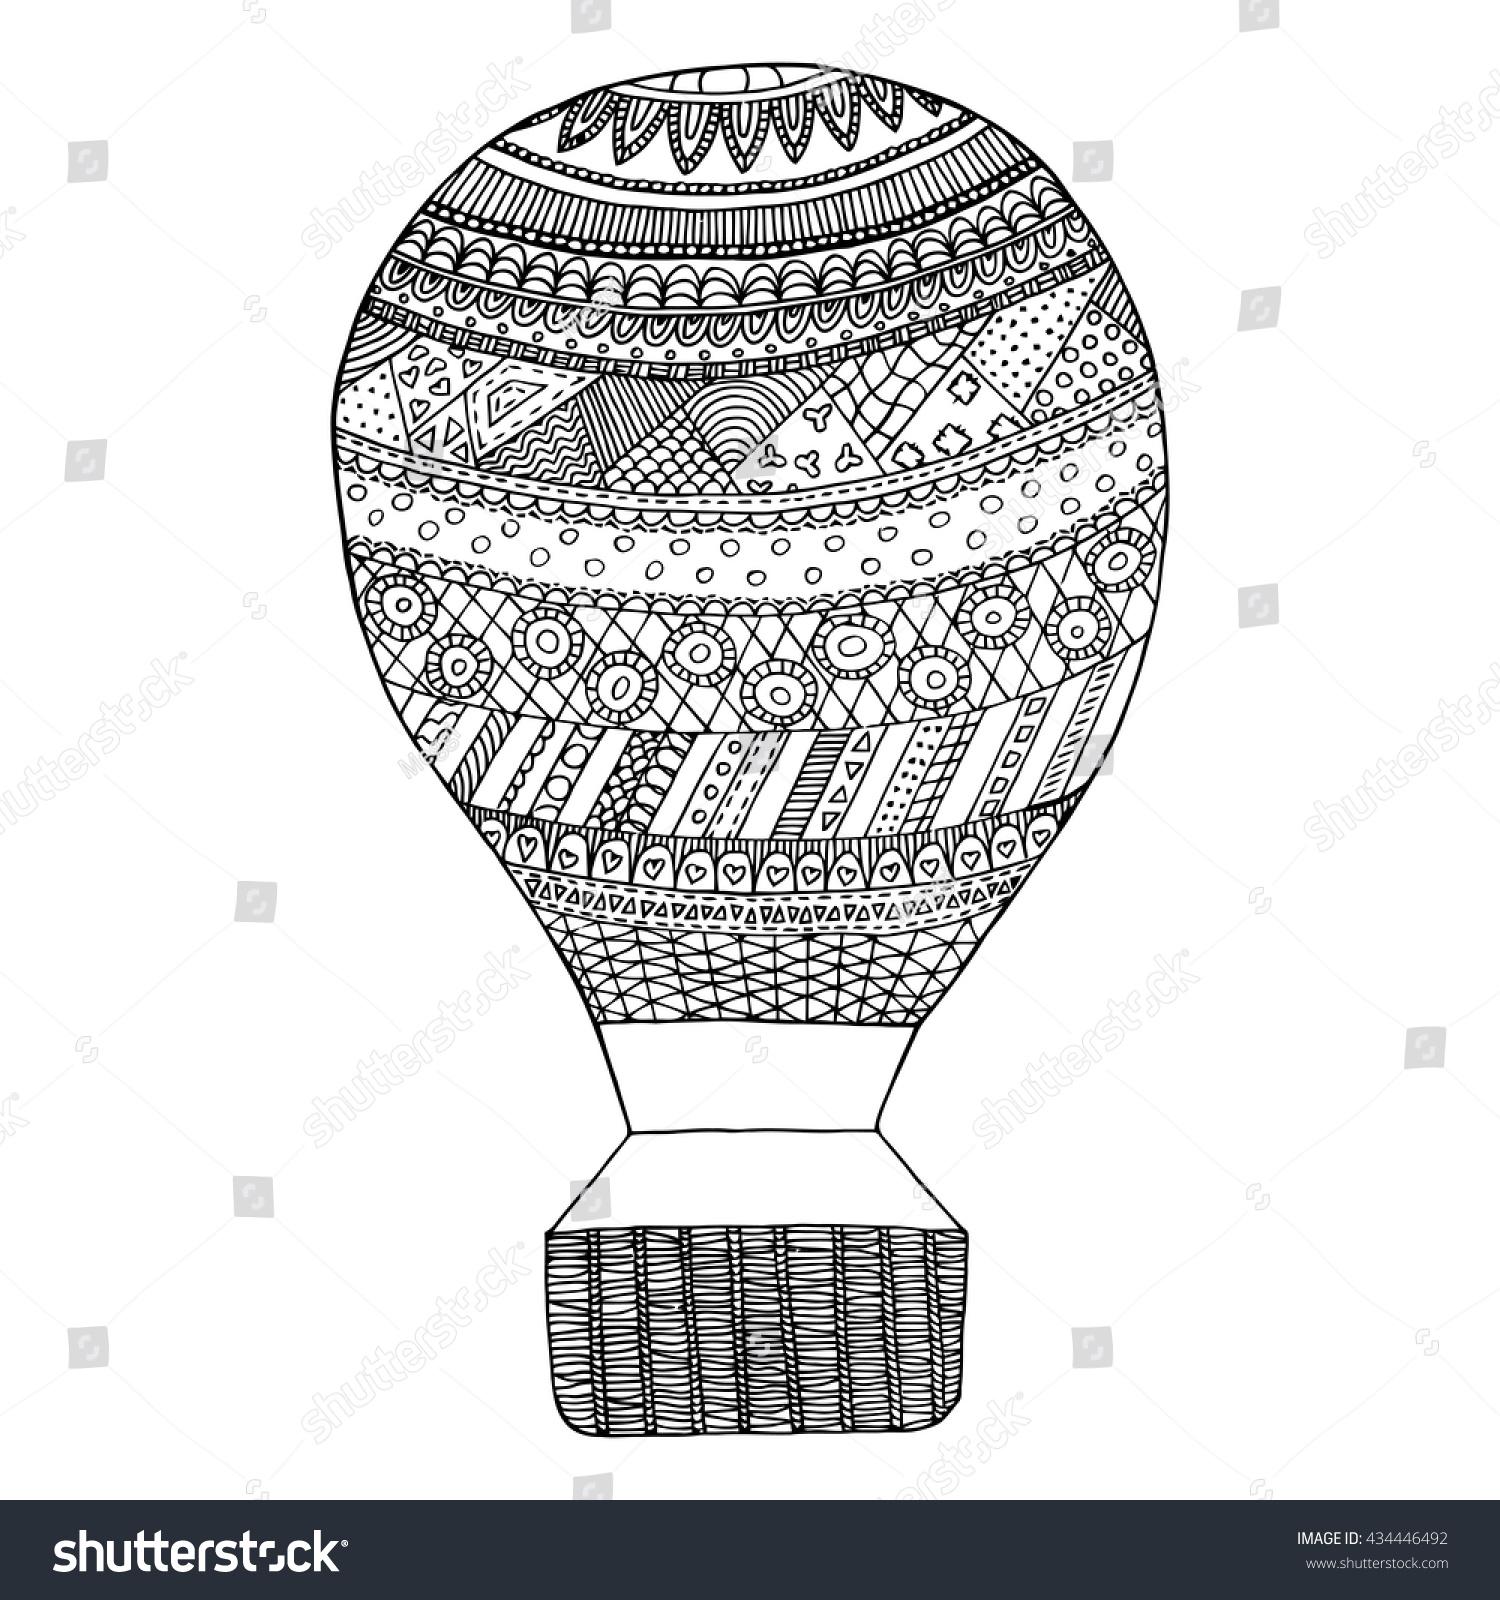 Hot Air Balloon Vector Zen Tangle Stock Vector 434446492 - Shutterstock